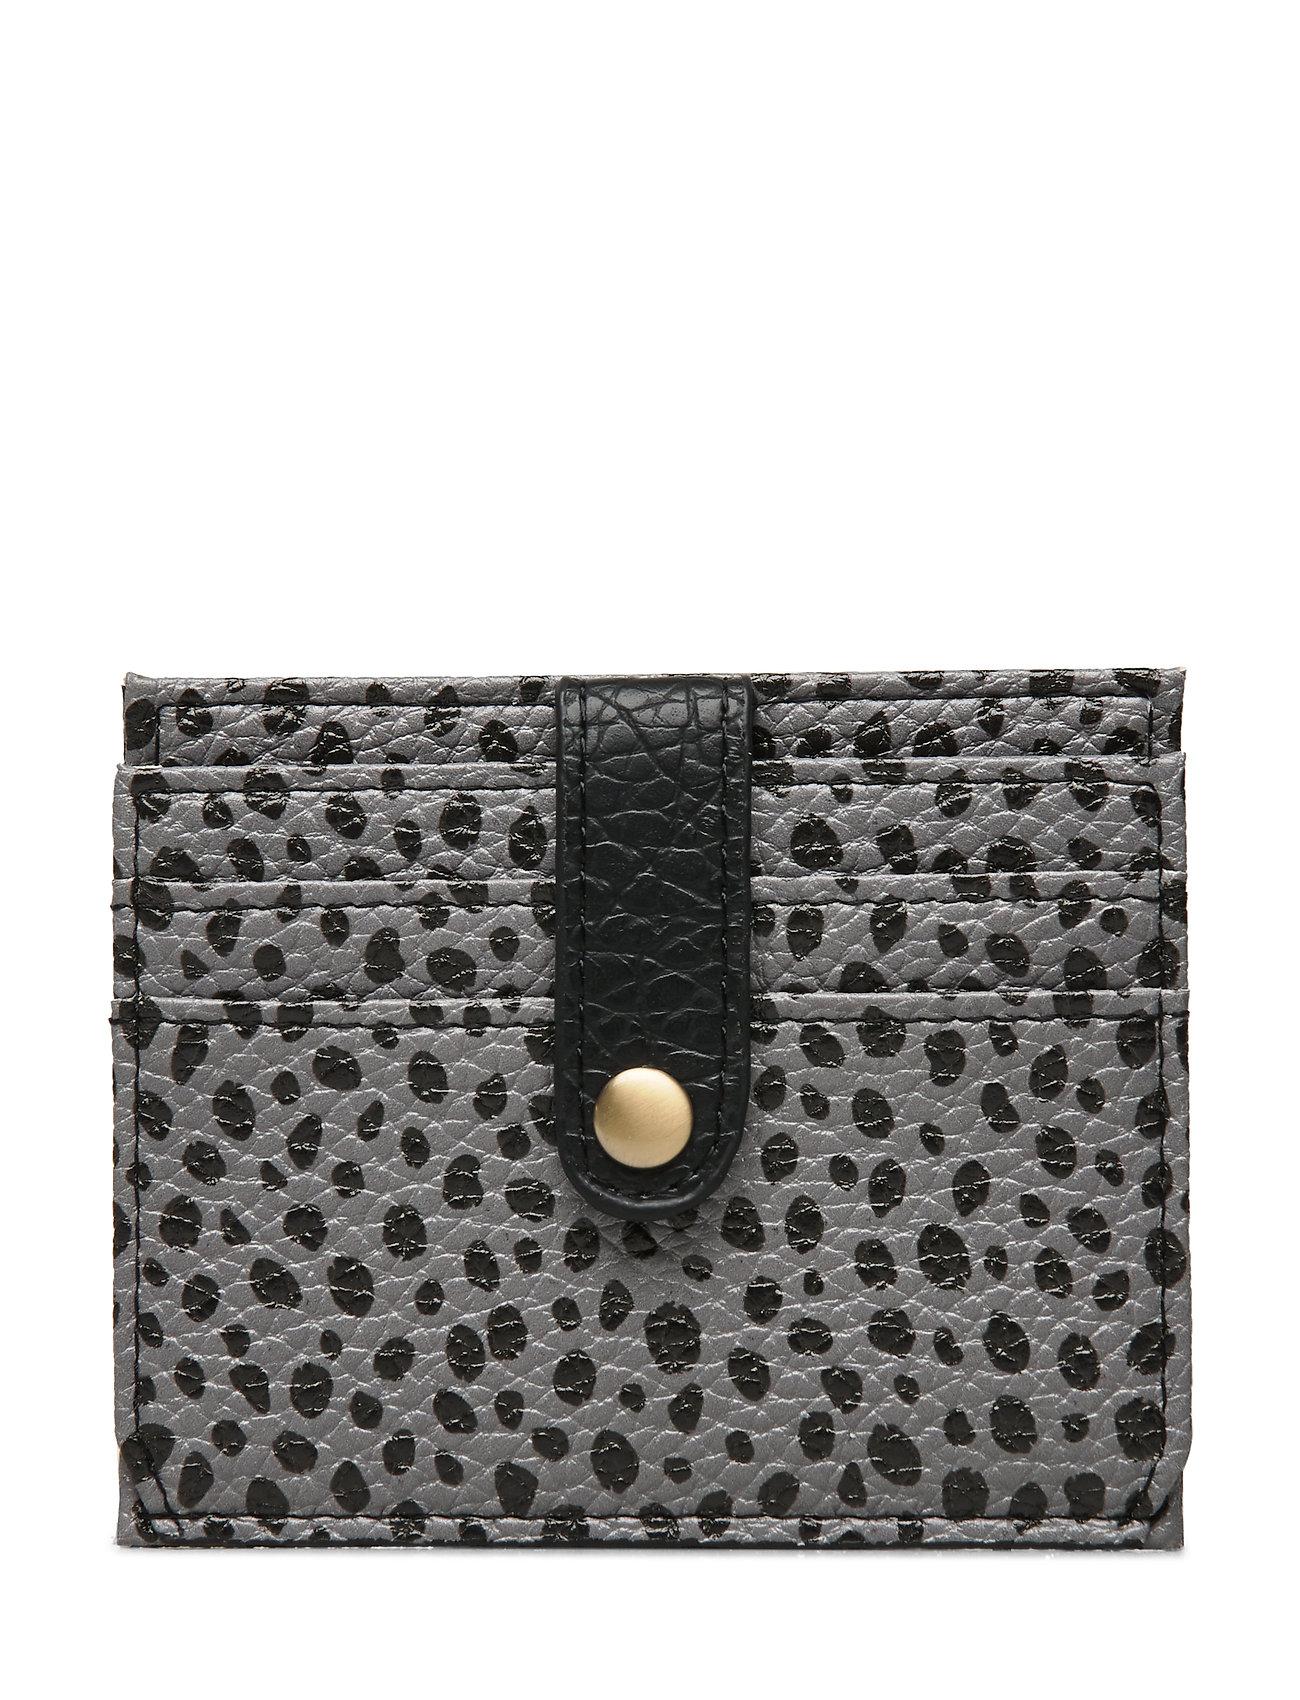 Image of Stile Card Pipol Holder Dot Grey Bags Card Holders & Wallets Card Holder Grå PIPOL'S BAZAAR (3309259857)